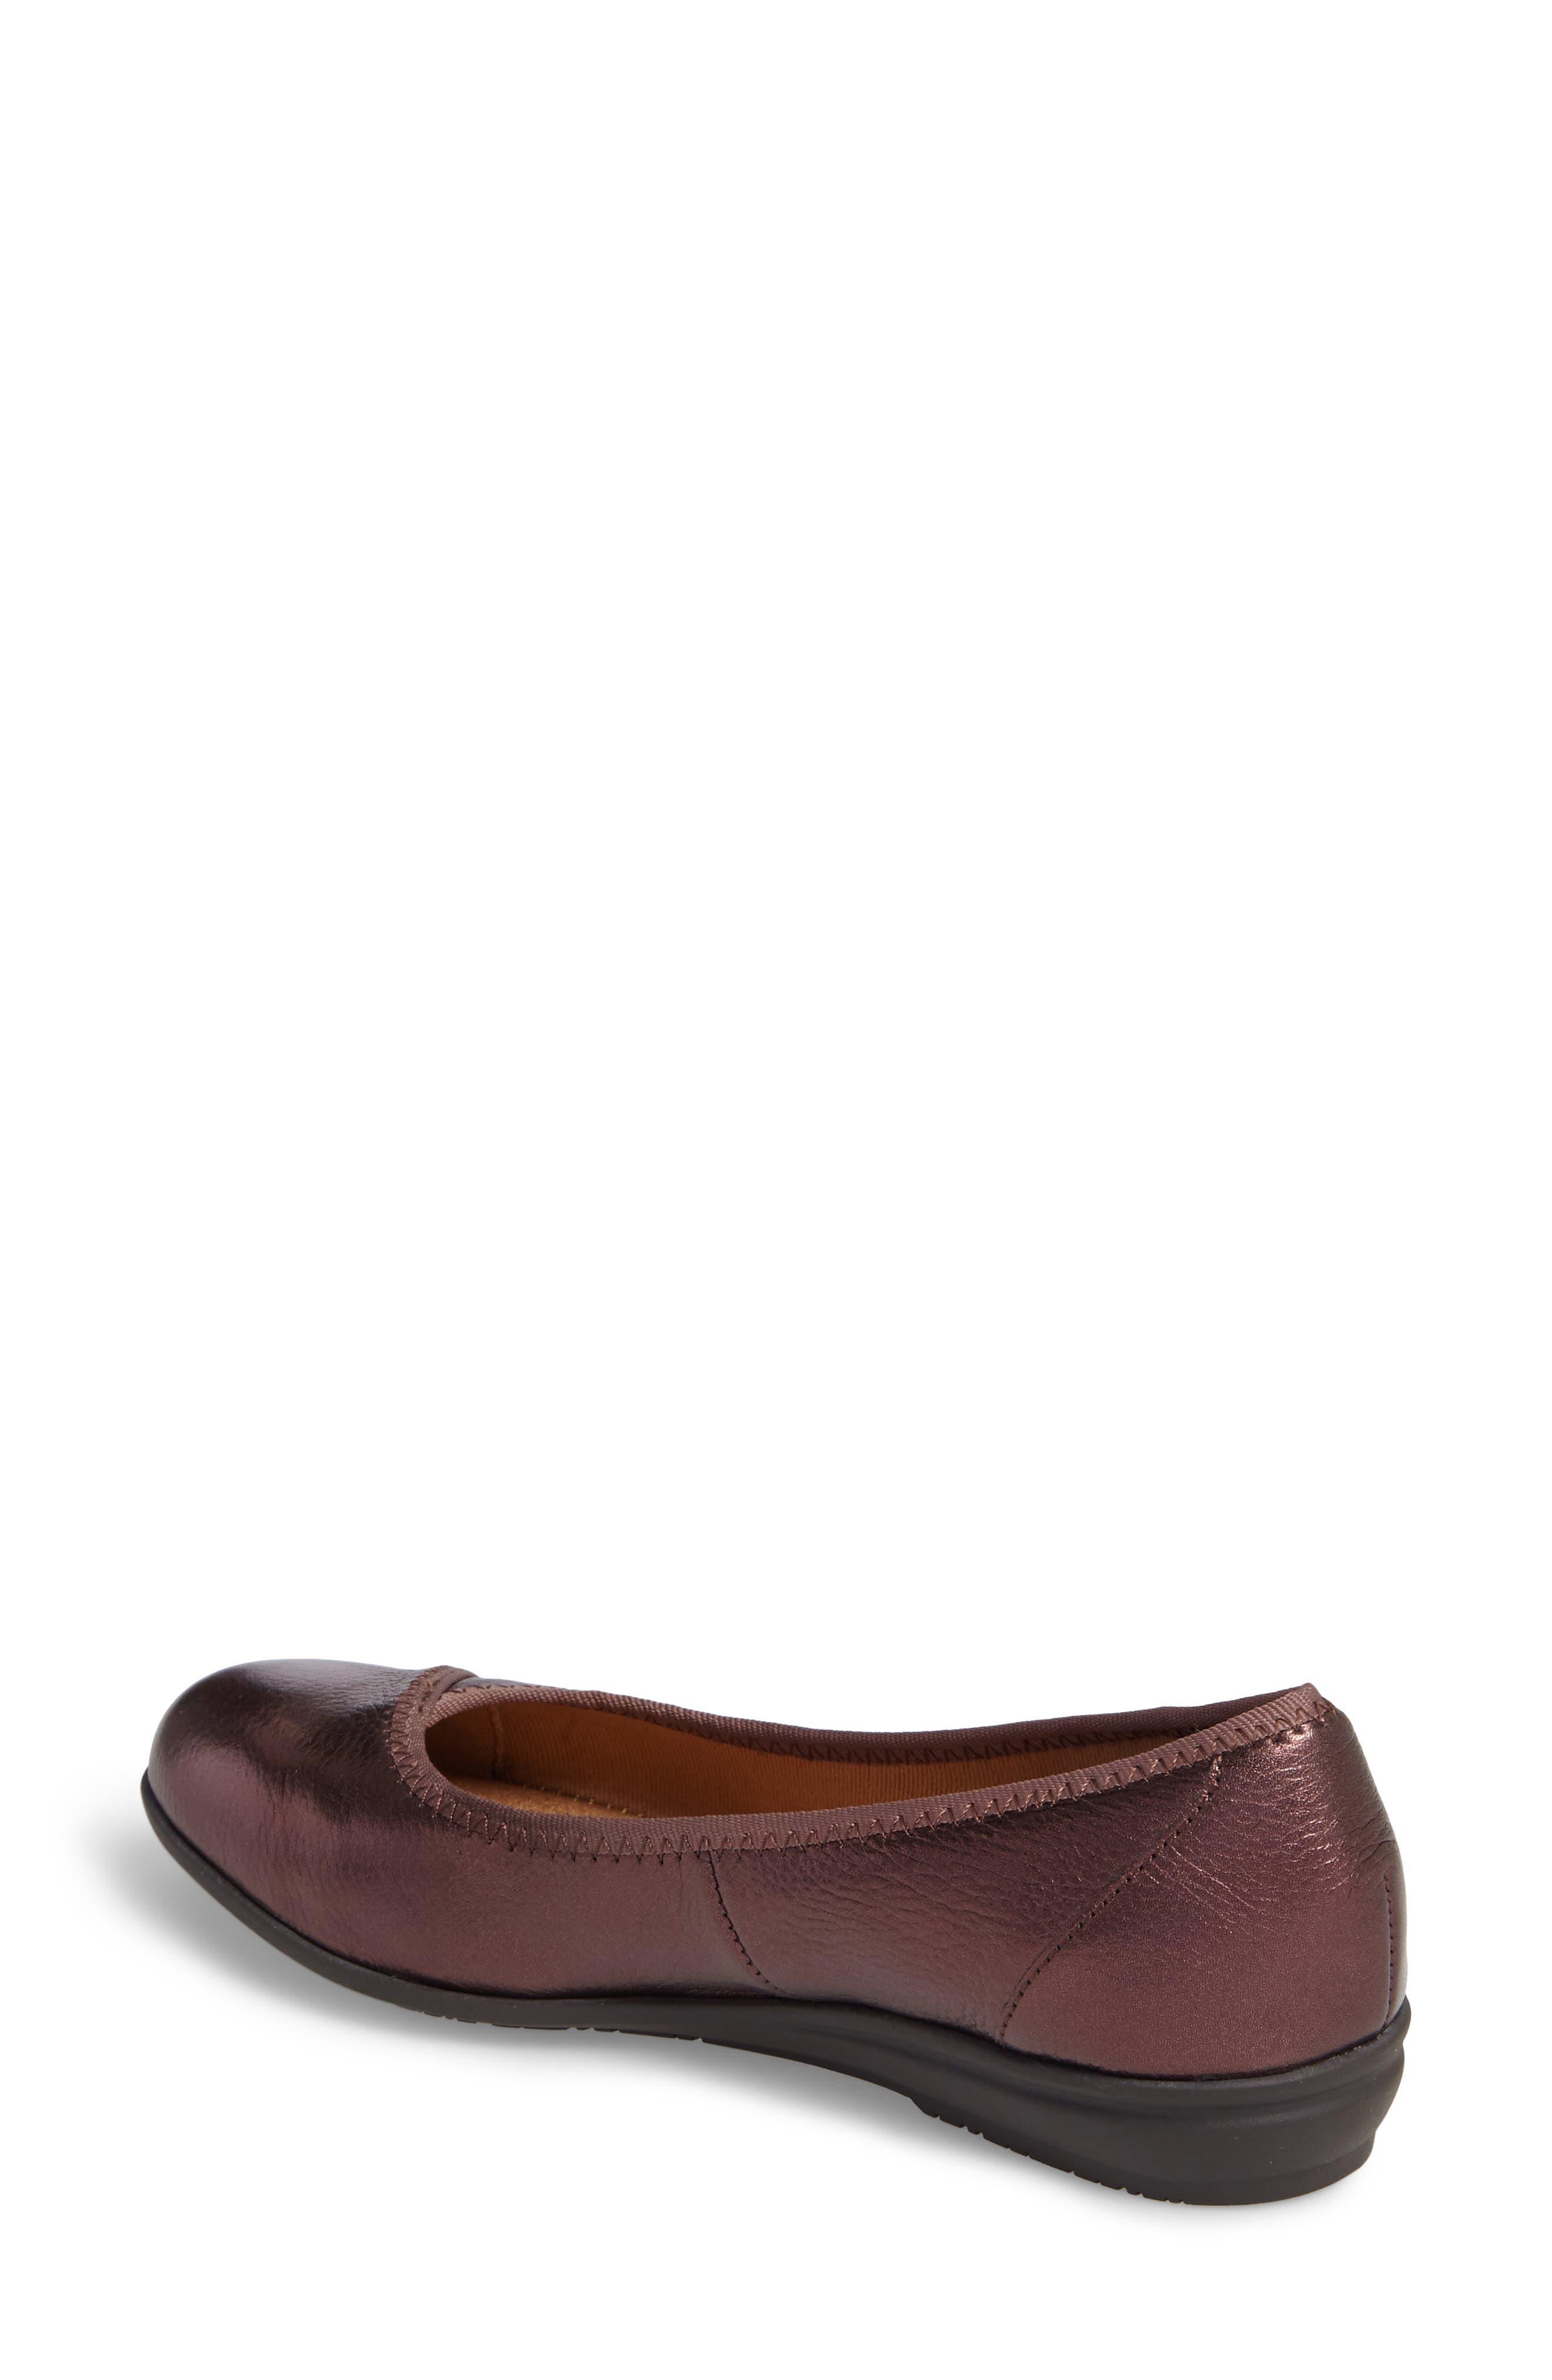 Eaton Flat,                             Alternate thumbnail 2, color,                             Chianti Metallic Leather